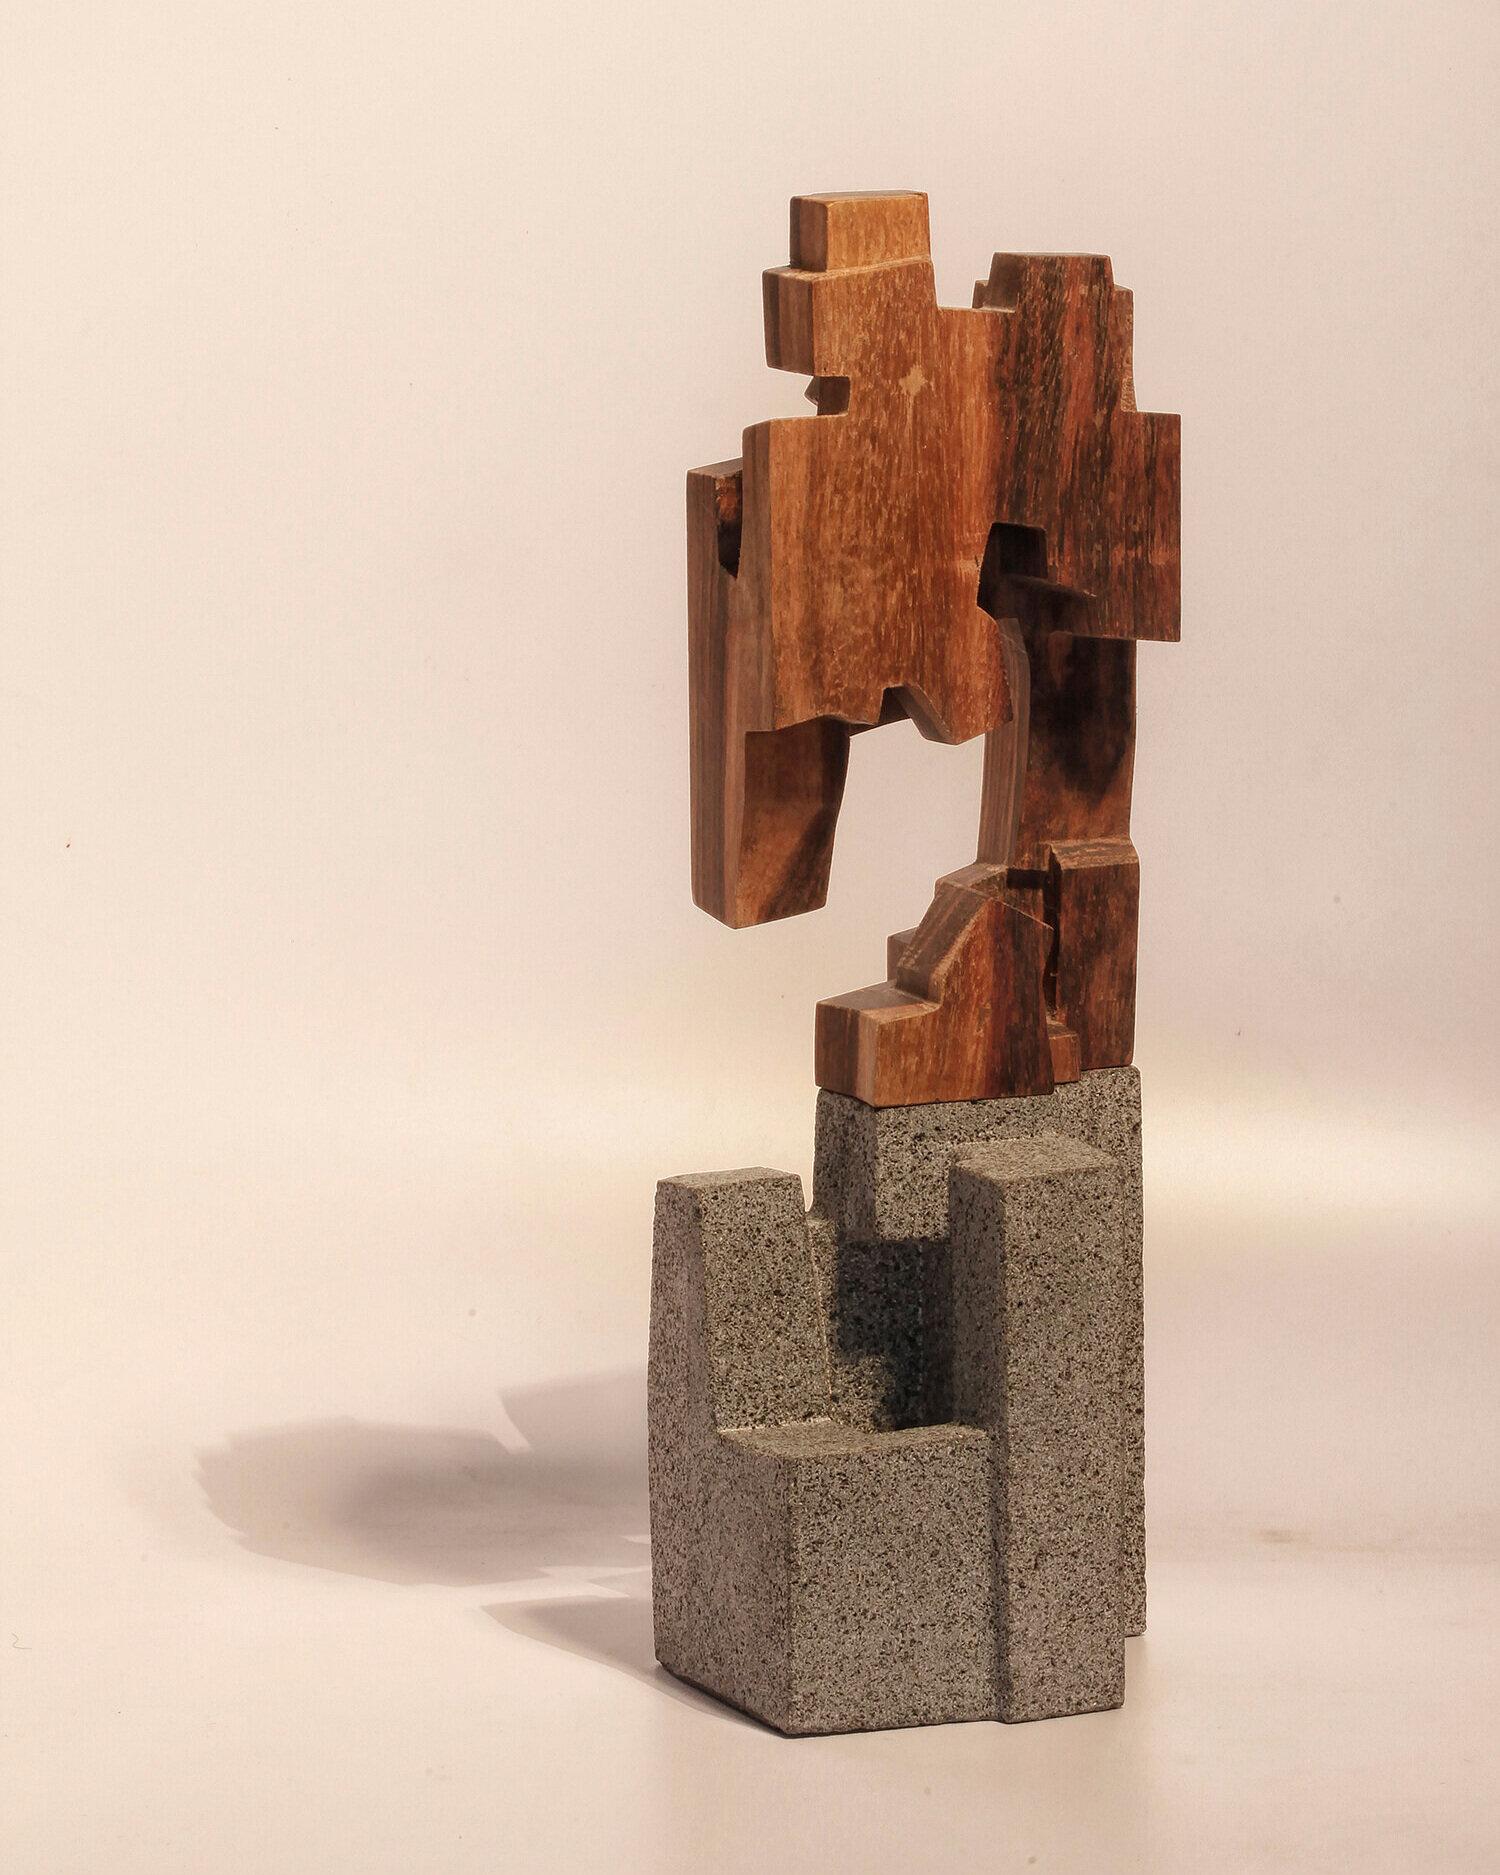 web-sin-titulo-untitled-sculpture-wood-volcanic-stone-3Jorge-Yazpik-MarionFriedmannGallerylr.jpg